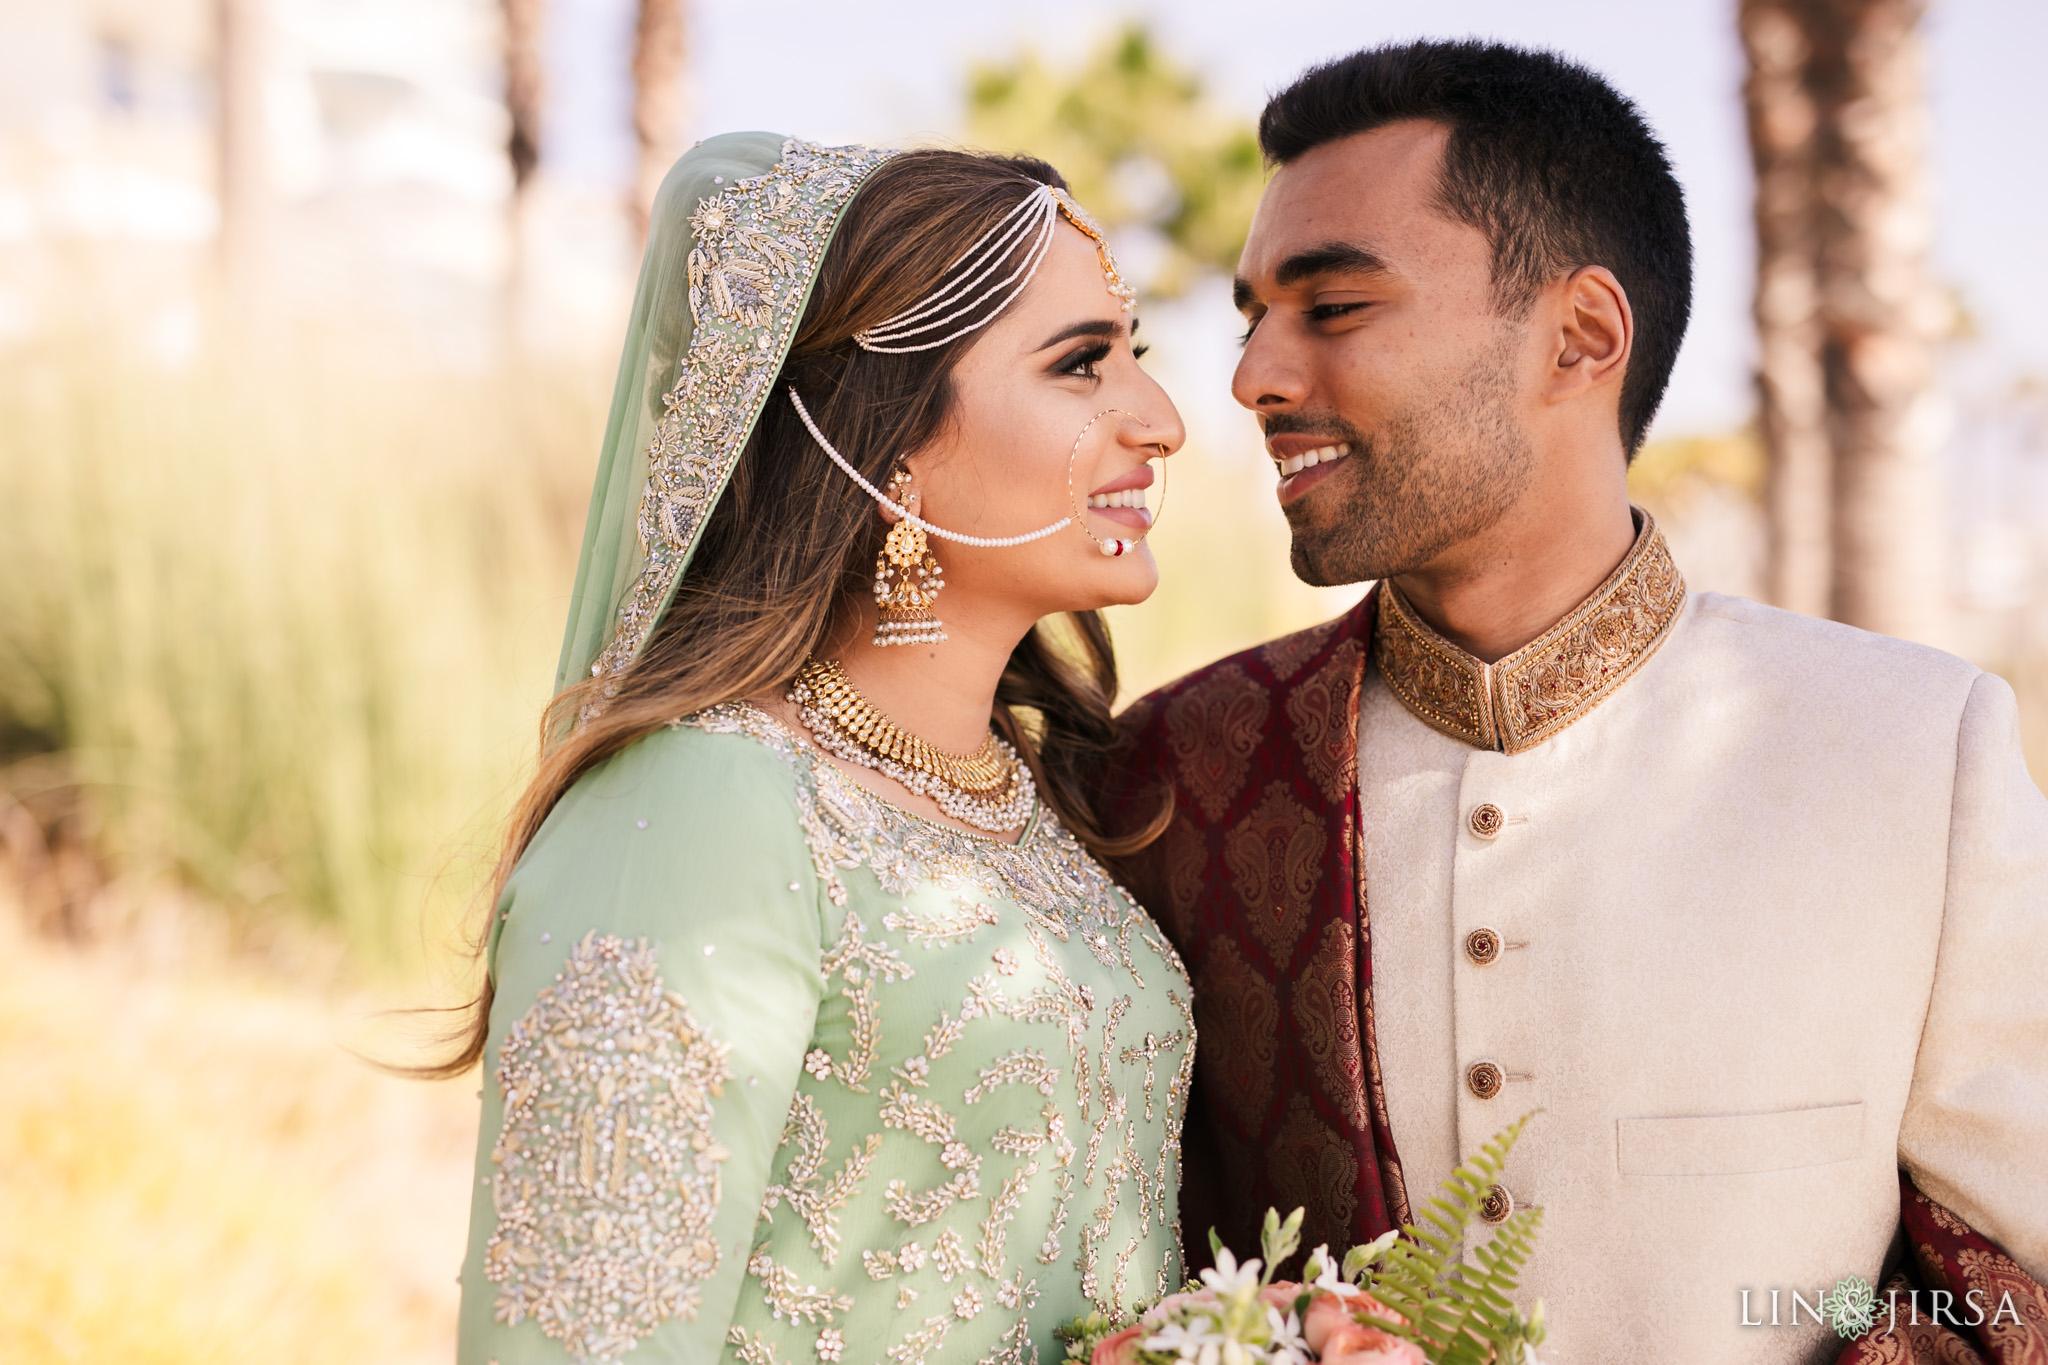 011 pasea hotel huntington beach pakistani muslim wedding photography